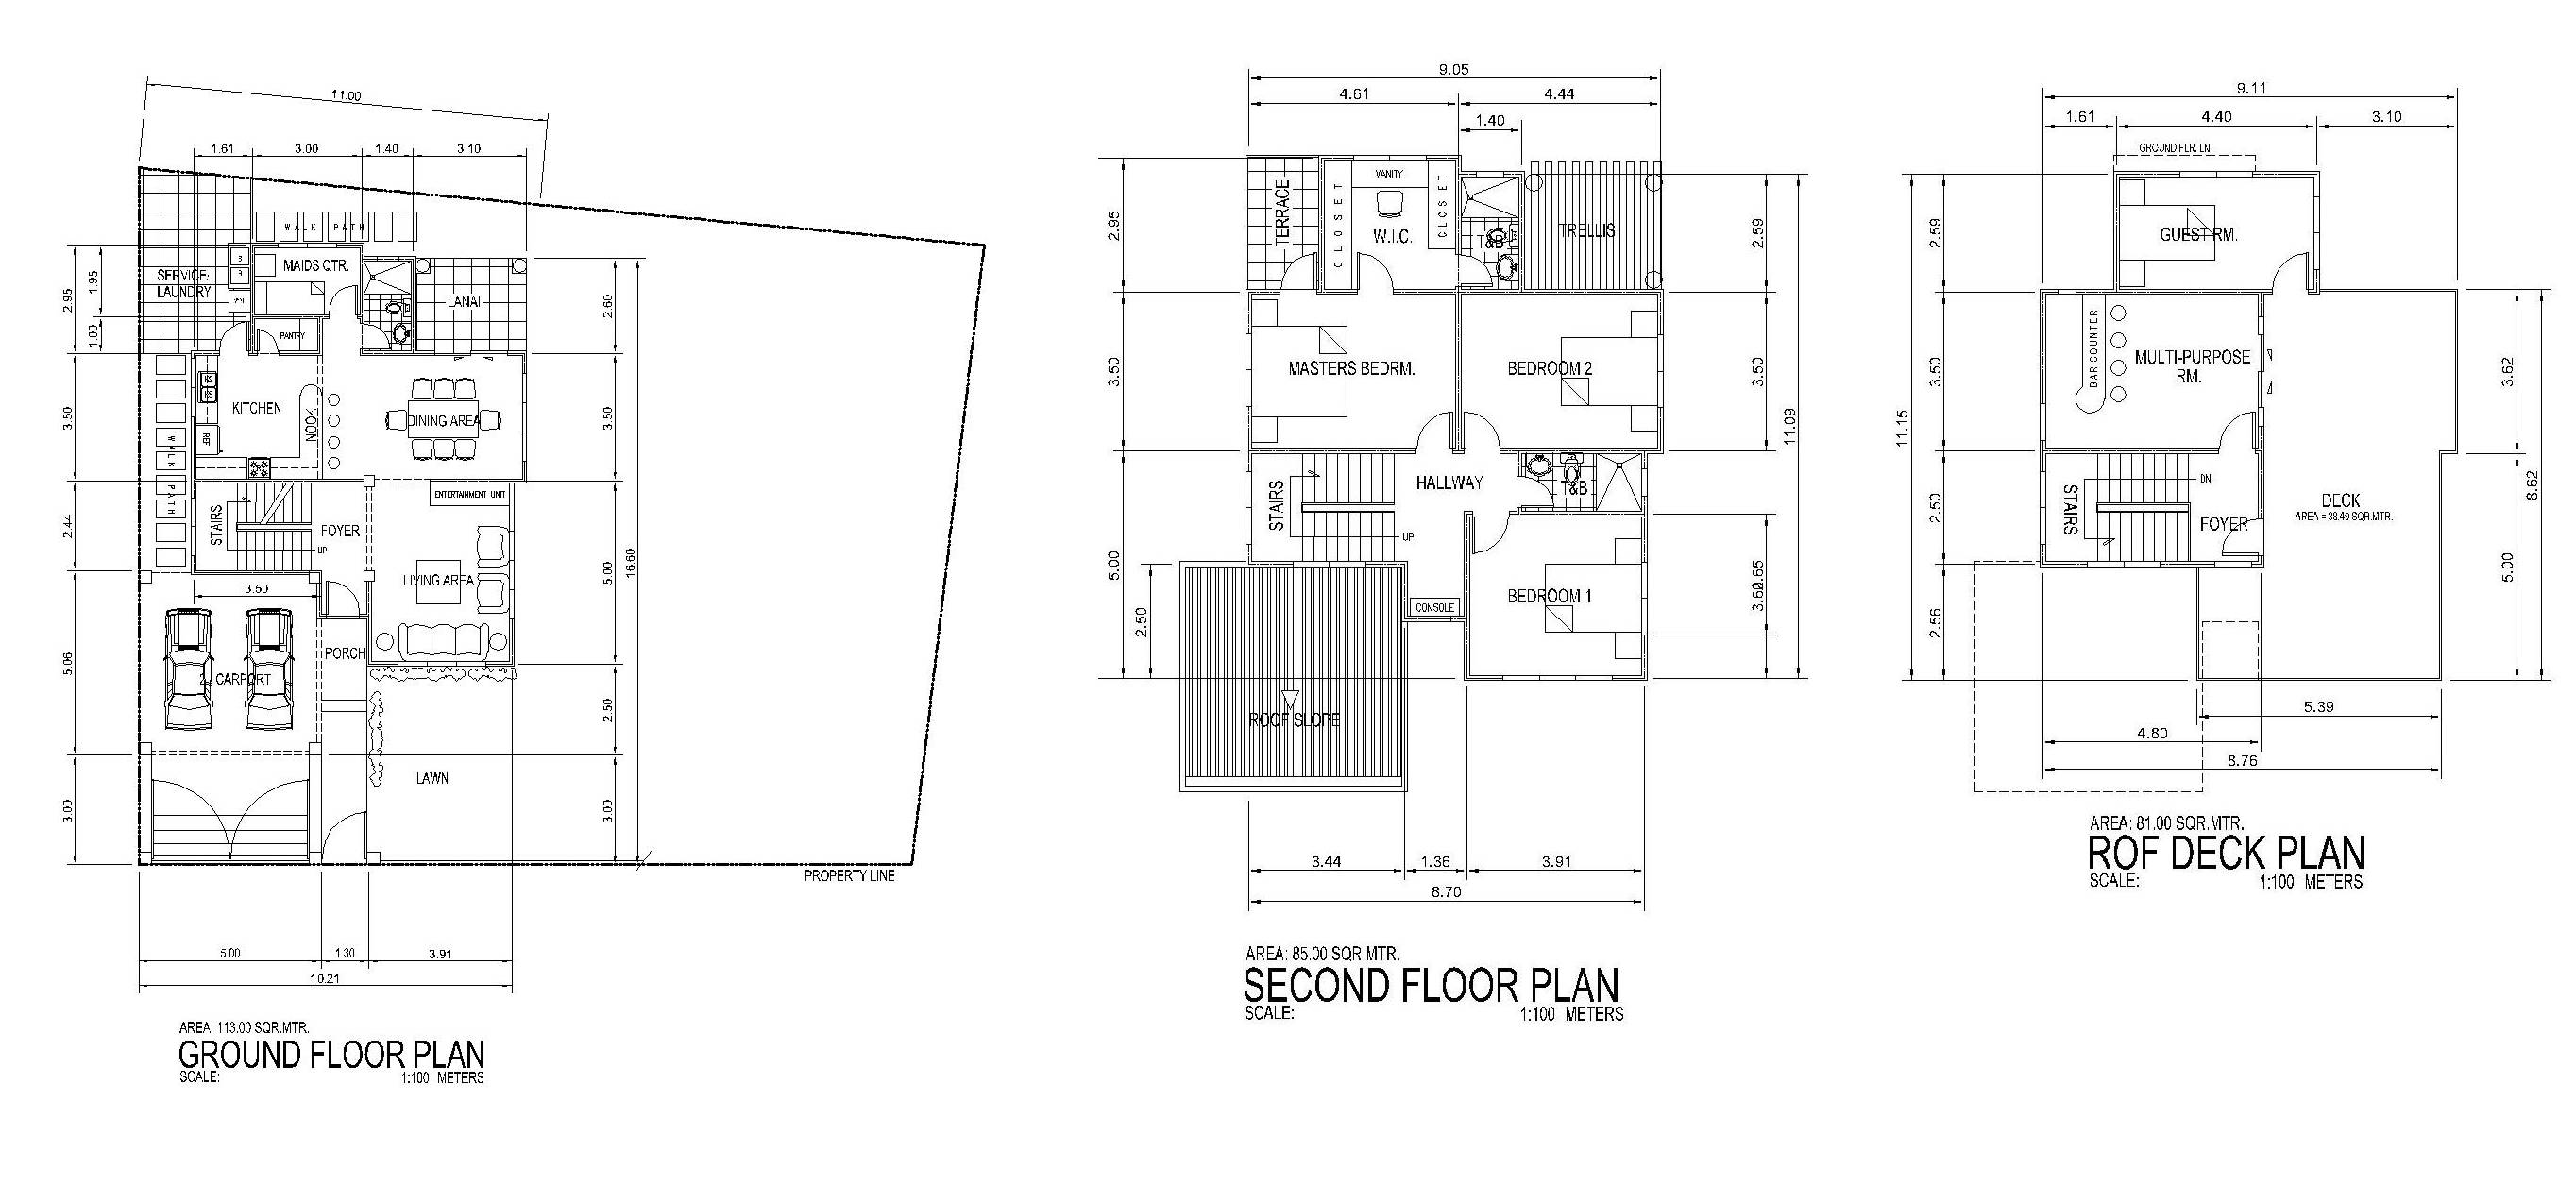 3 Story Modern Beach House Plans Arts With Roof Deck Floor 2 Lrg